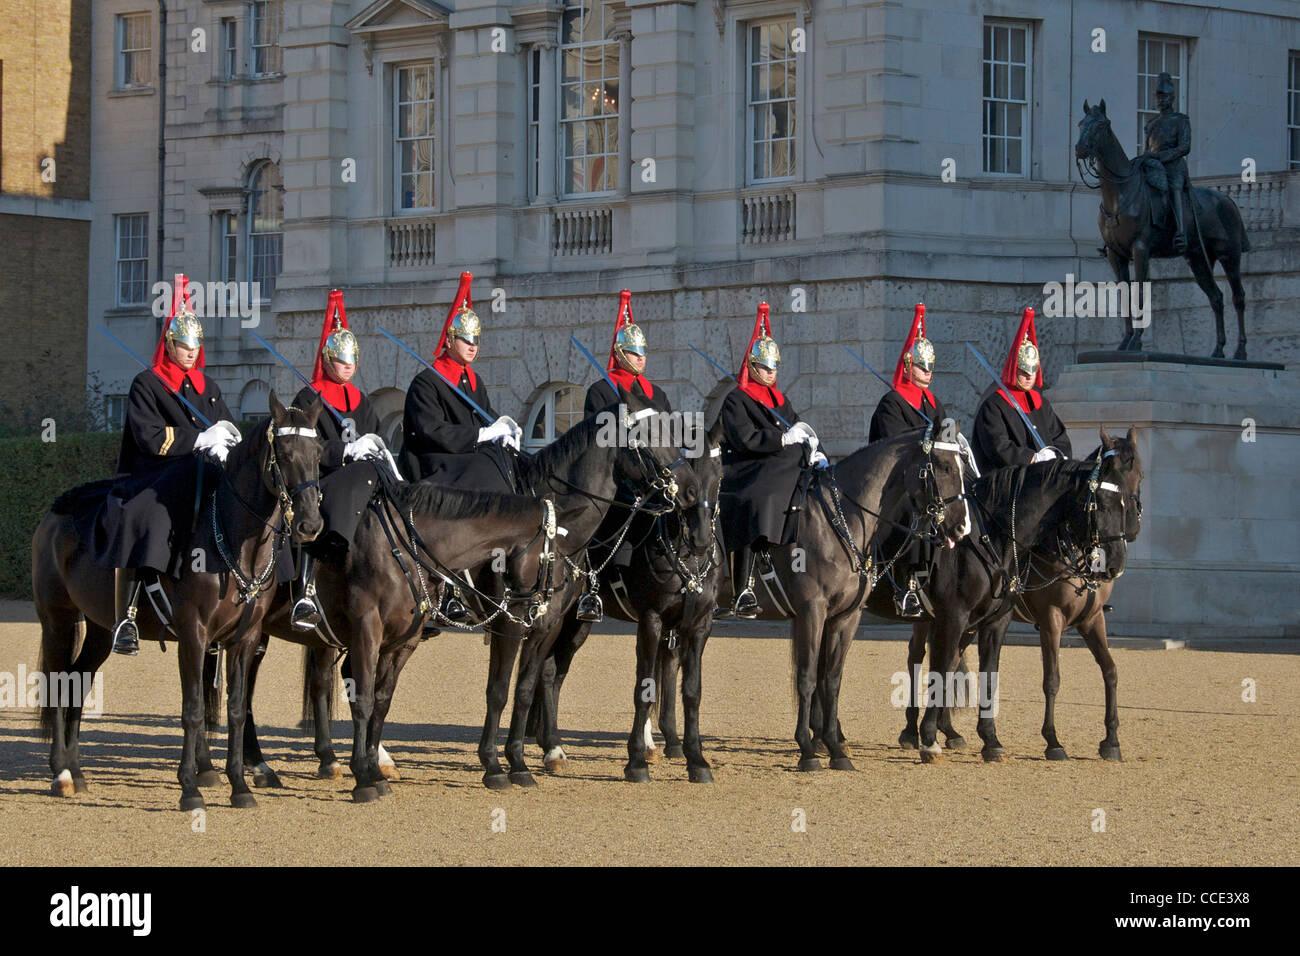 Seven guardsmen on horseback Horse Guards Parade London England - Stock Image